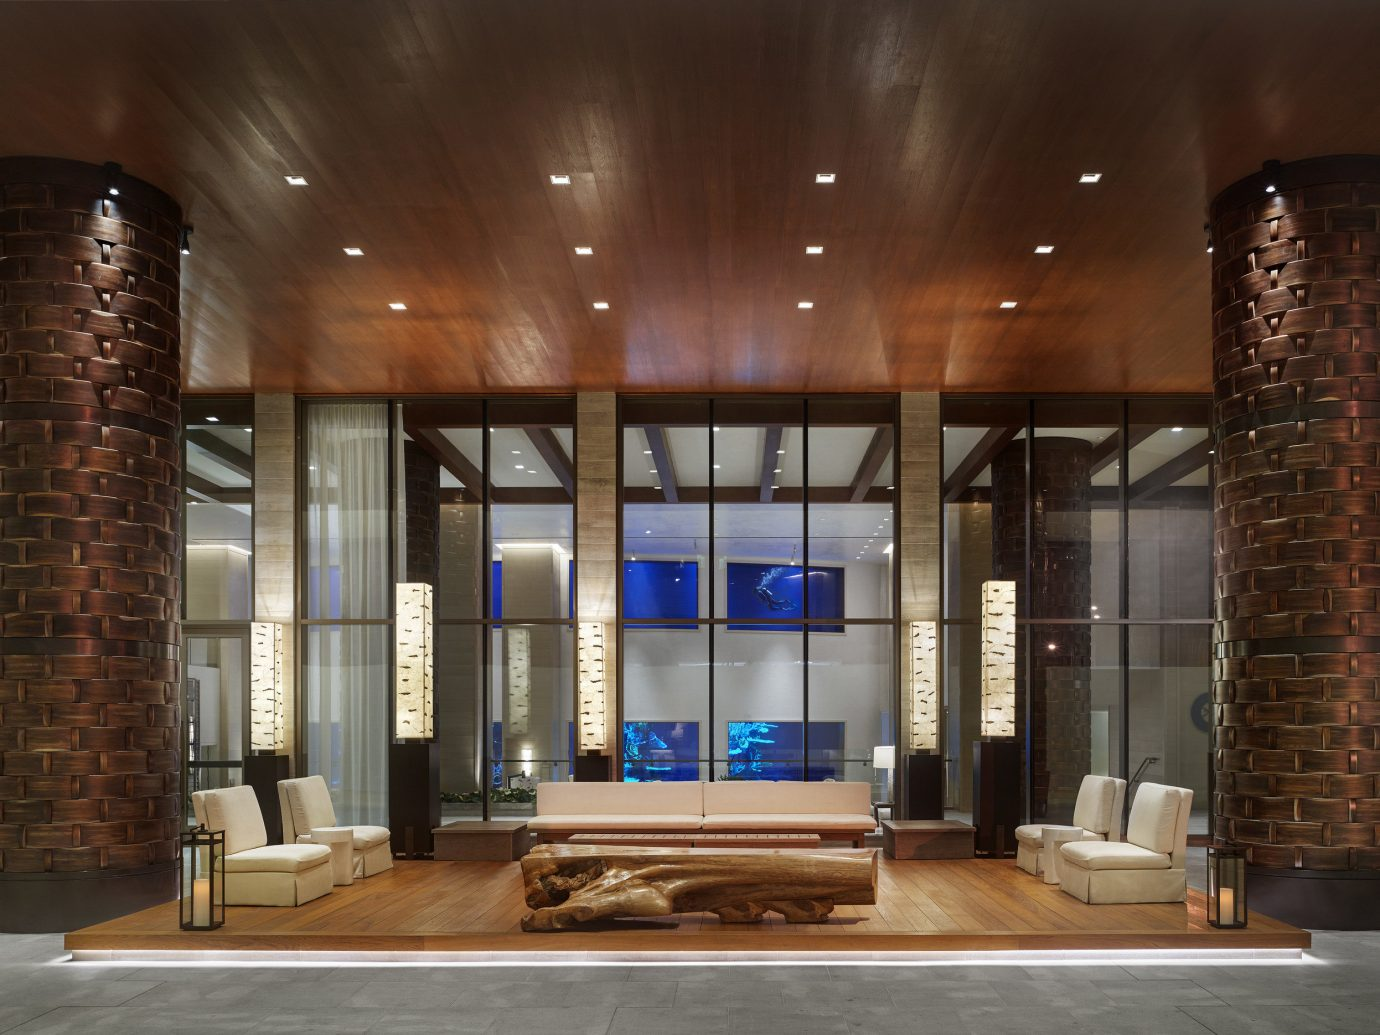 Boutique Hotels Hawaii Honolulu Hotels indoor ceiling Lobby interior design counter facade building condominium furniture